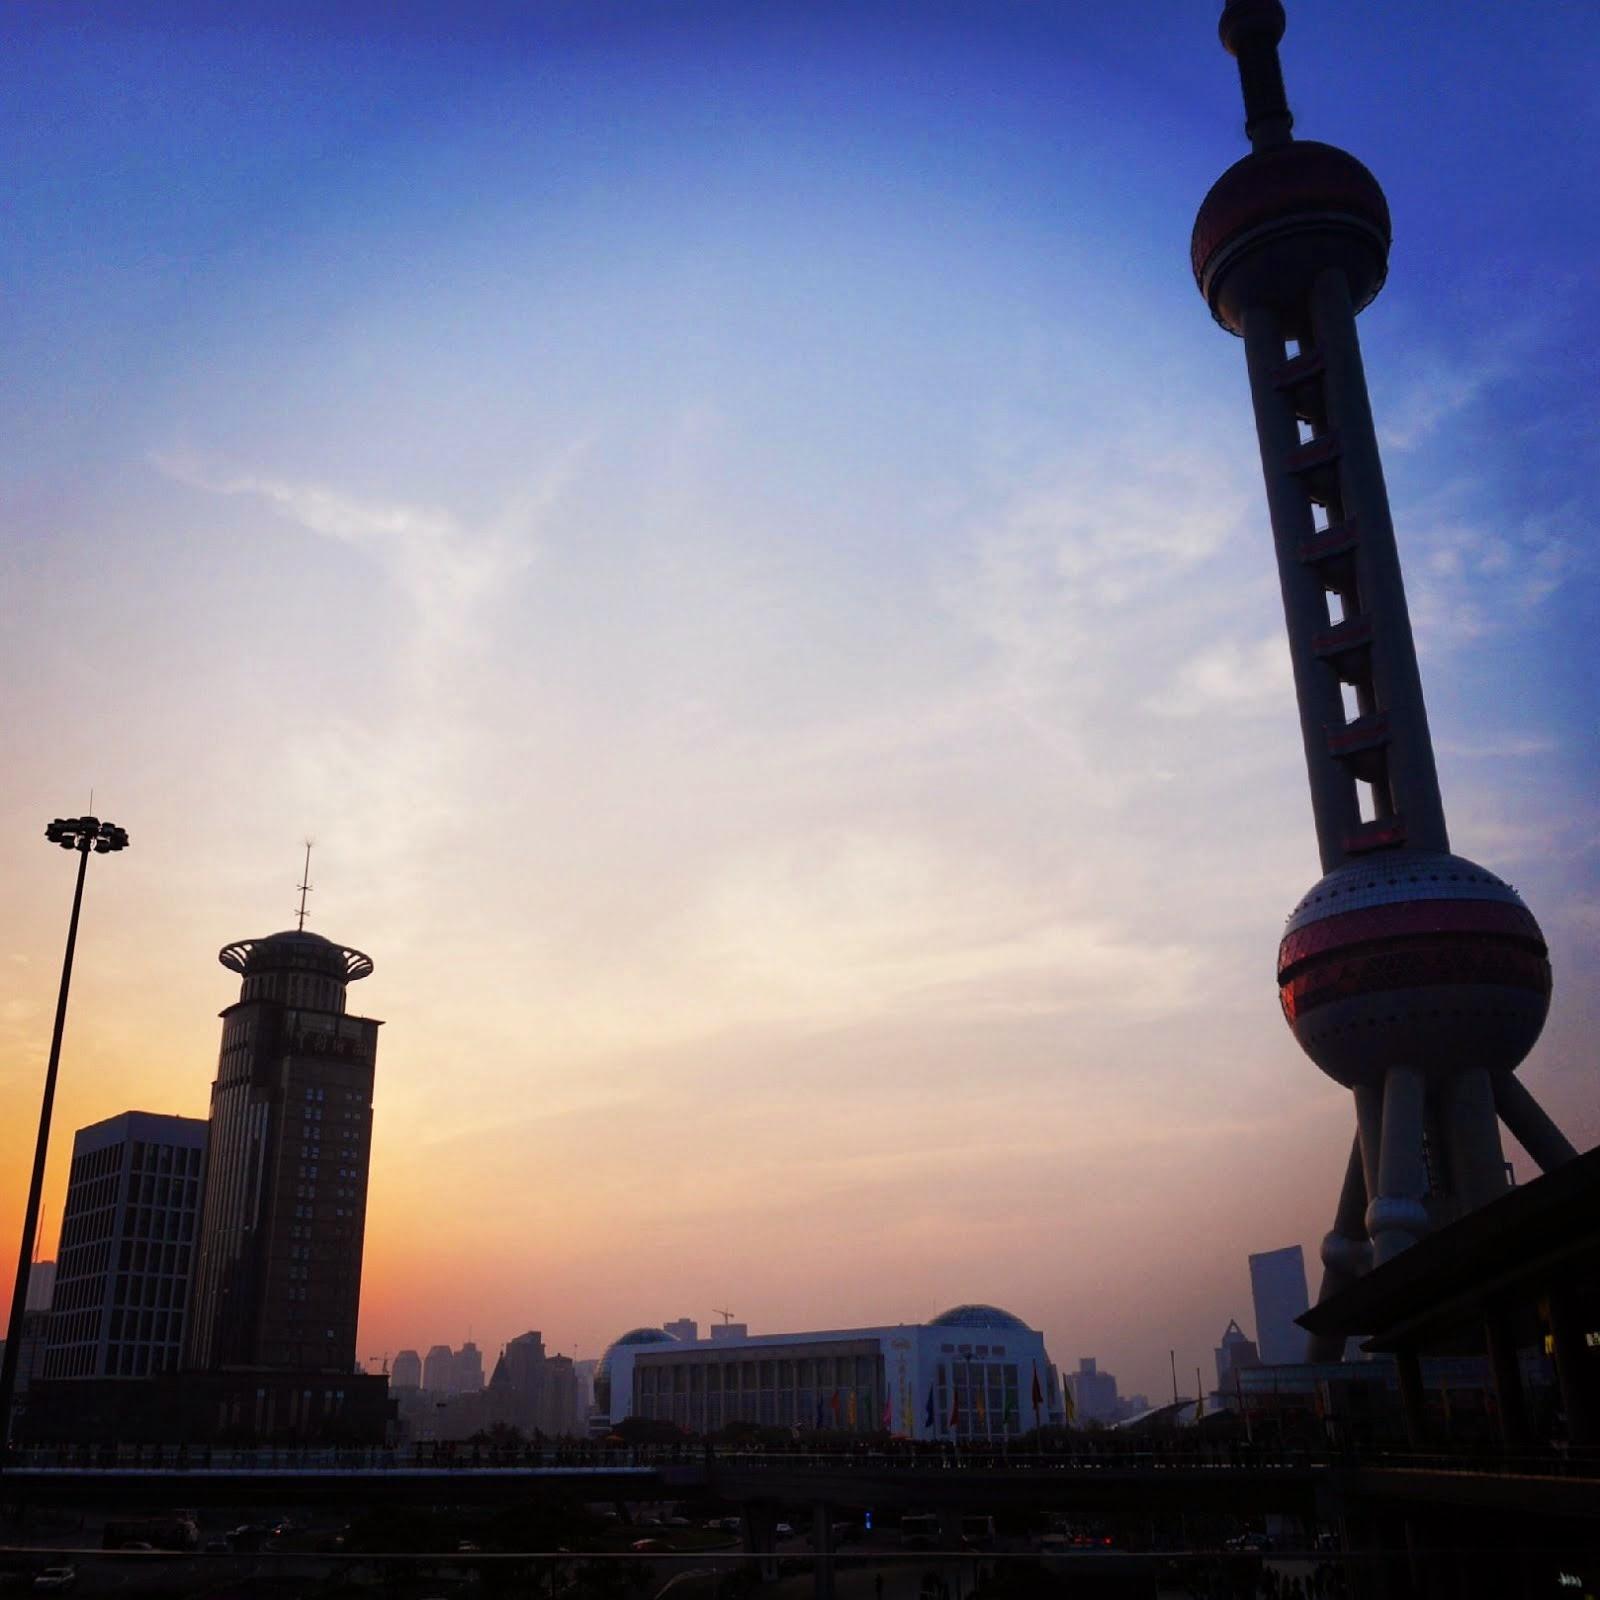 ORIENTAL PEARL TV TOWER SHANGHAI CHINA SUNSET